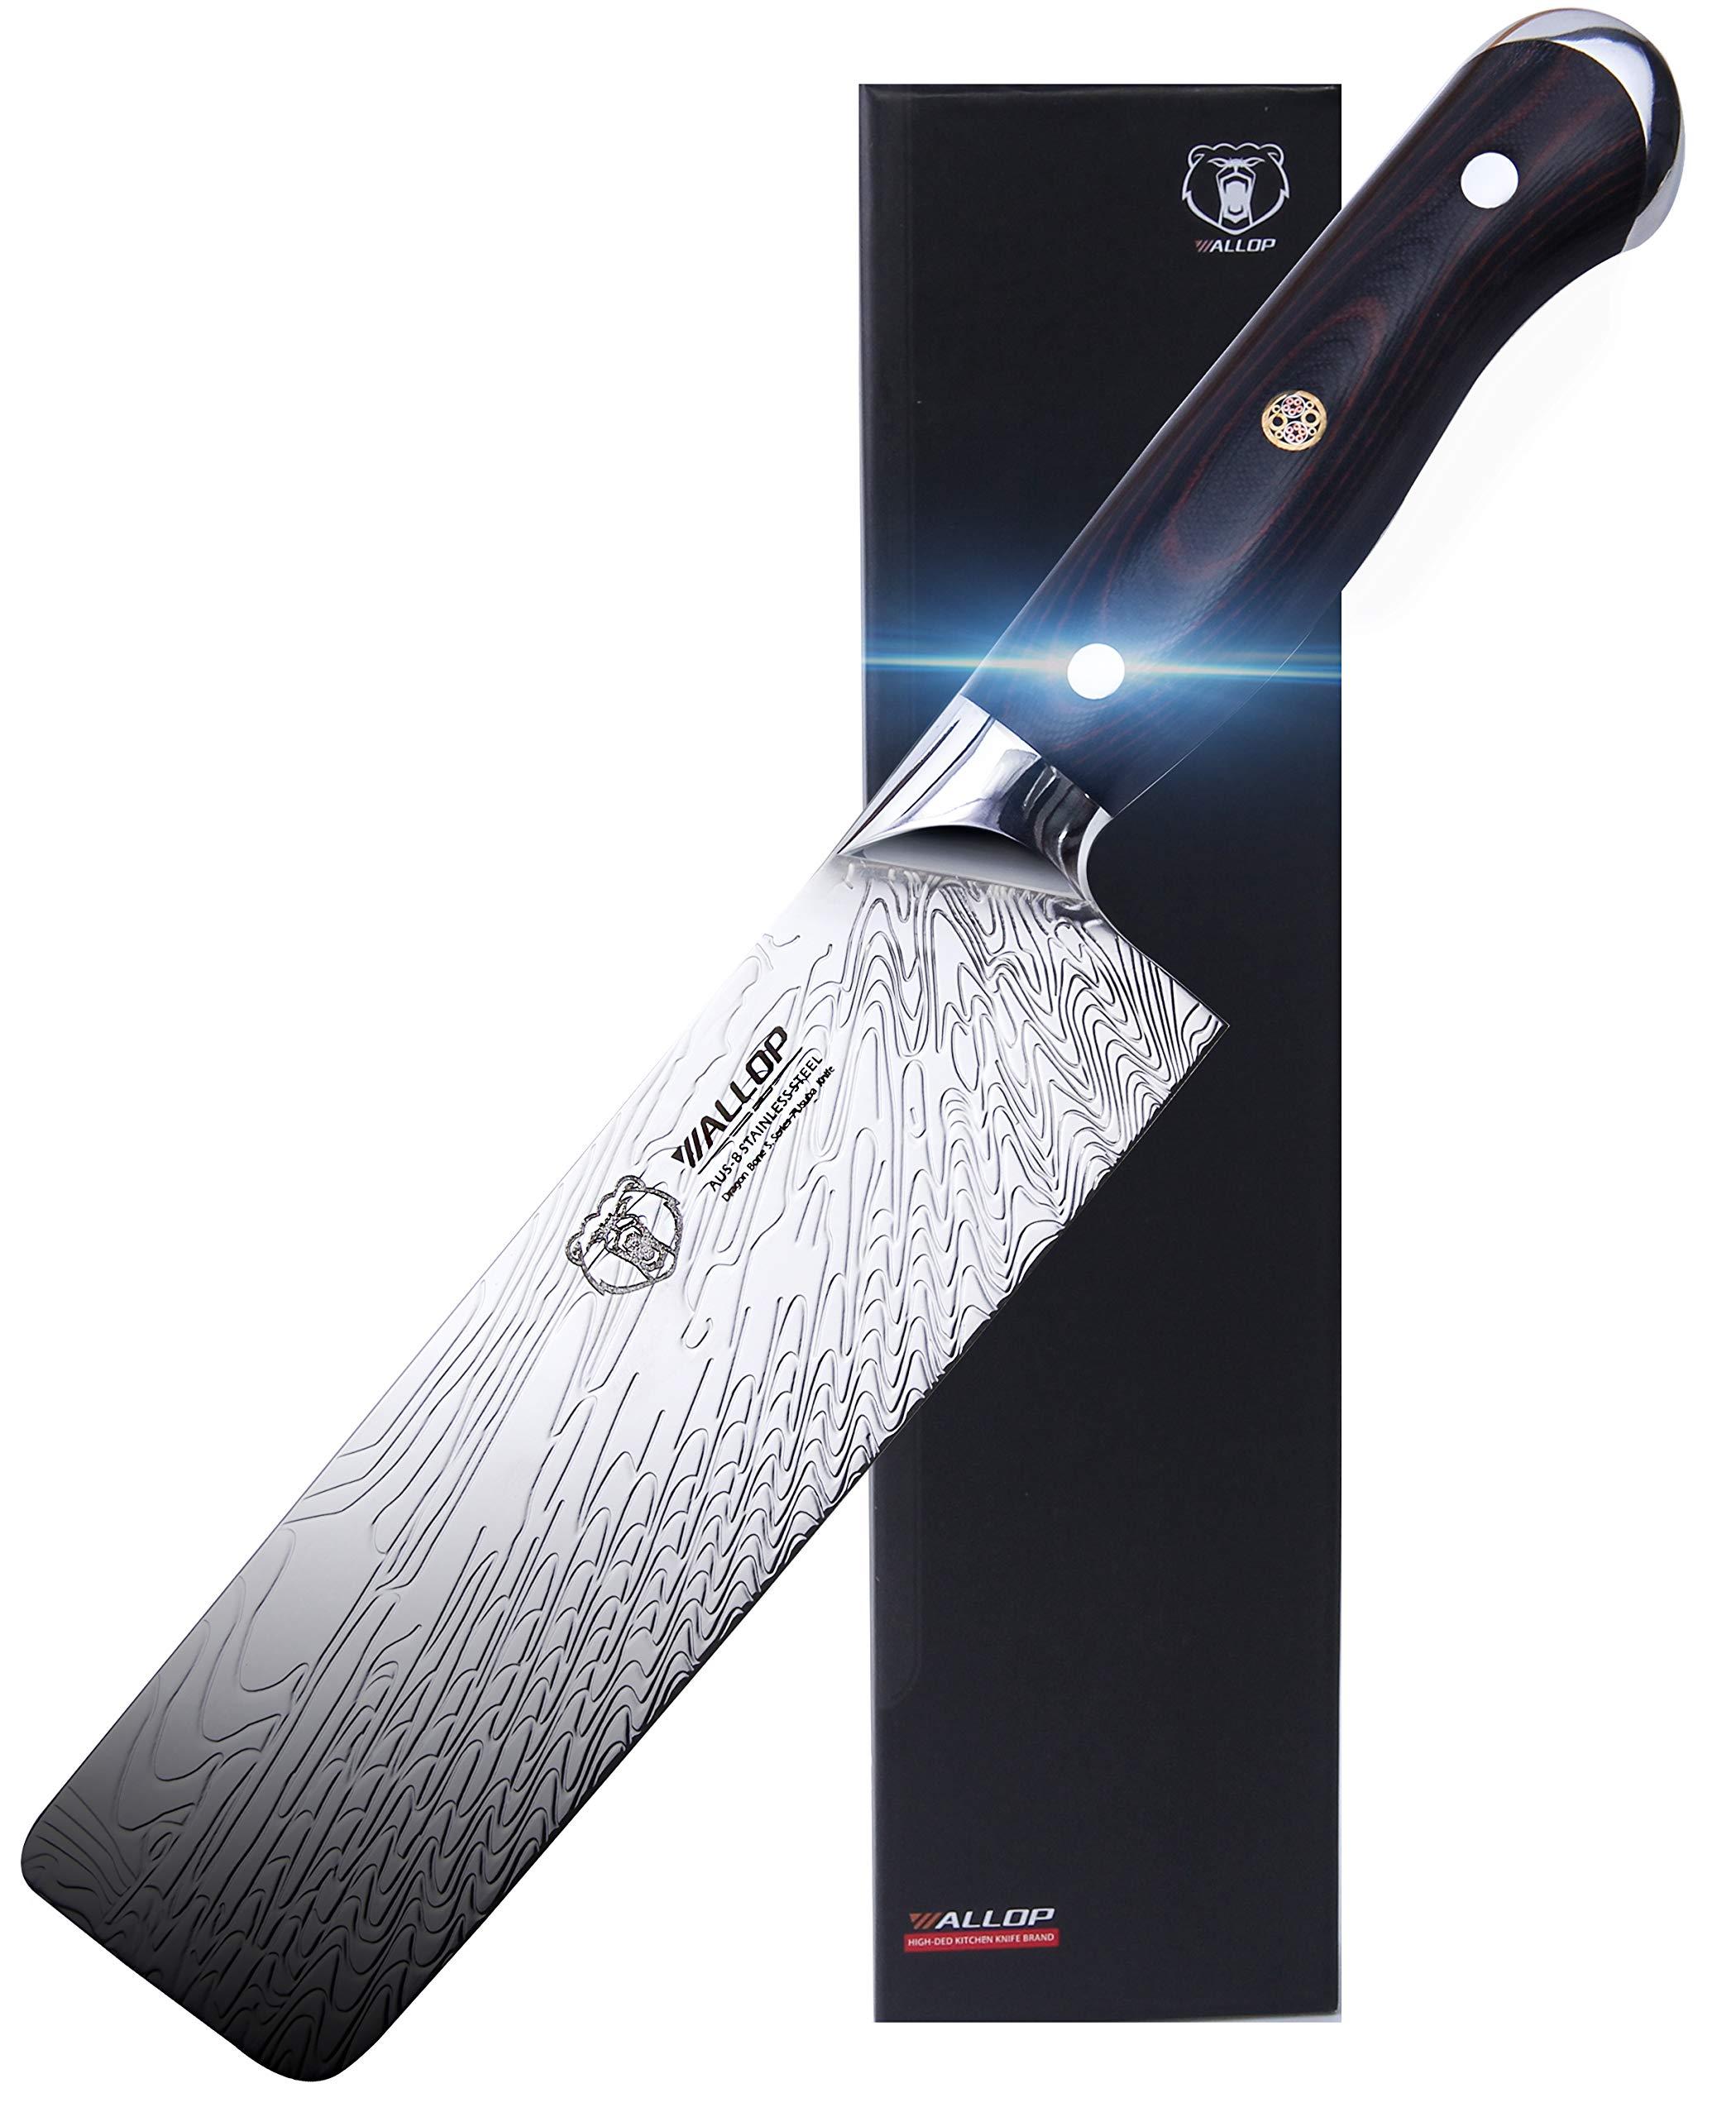 WALLOP Nakiri Knife - Japanese AUS-8 Stainless Steel Usuba Knife - Amazing Solar Pattern Well Balance Vegetable Salad Chopper Cutter Meat Cleaver Kitchen Knife - Ergonomic Full Tang G10 Handle - 7'' by WALLOP